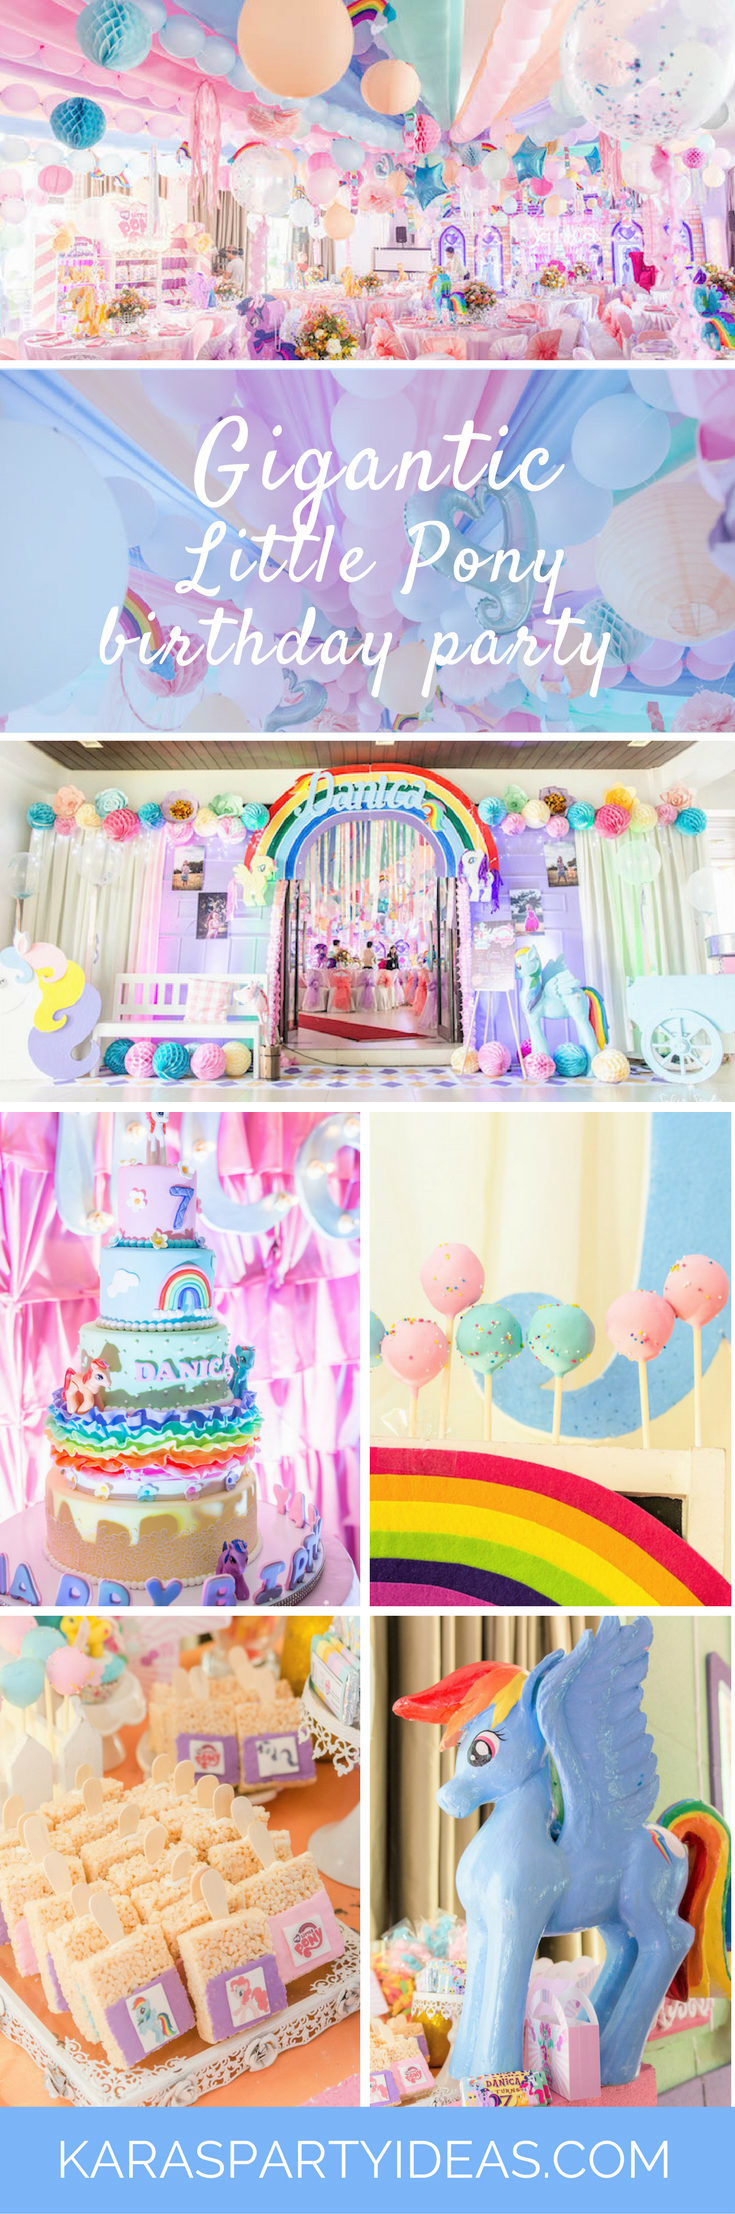 Gigantic Little Pony Birthday Party - Karas Party Ideas via KarasPartyIdeas.com